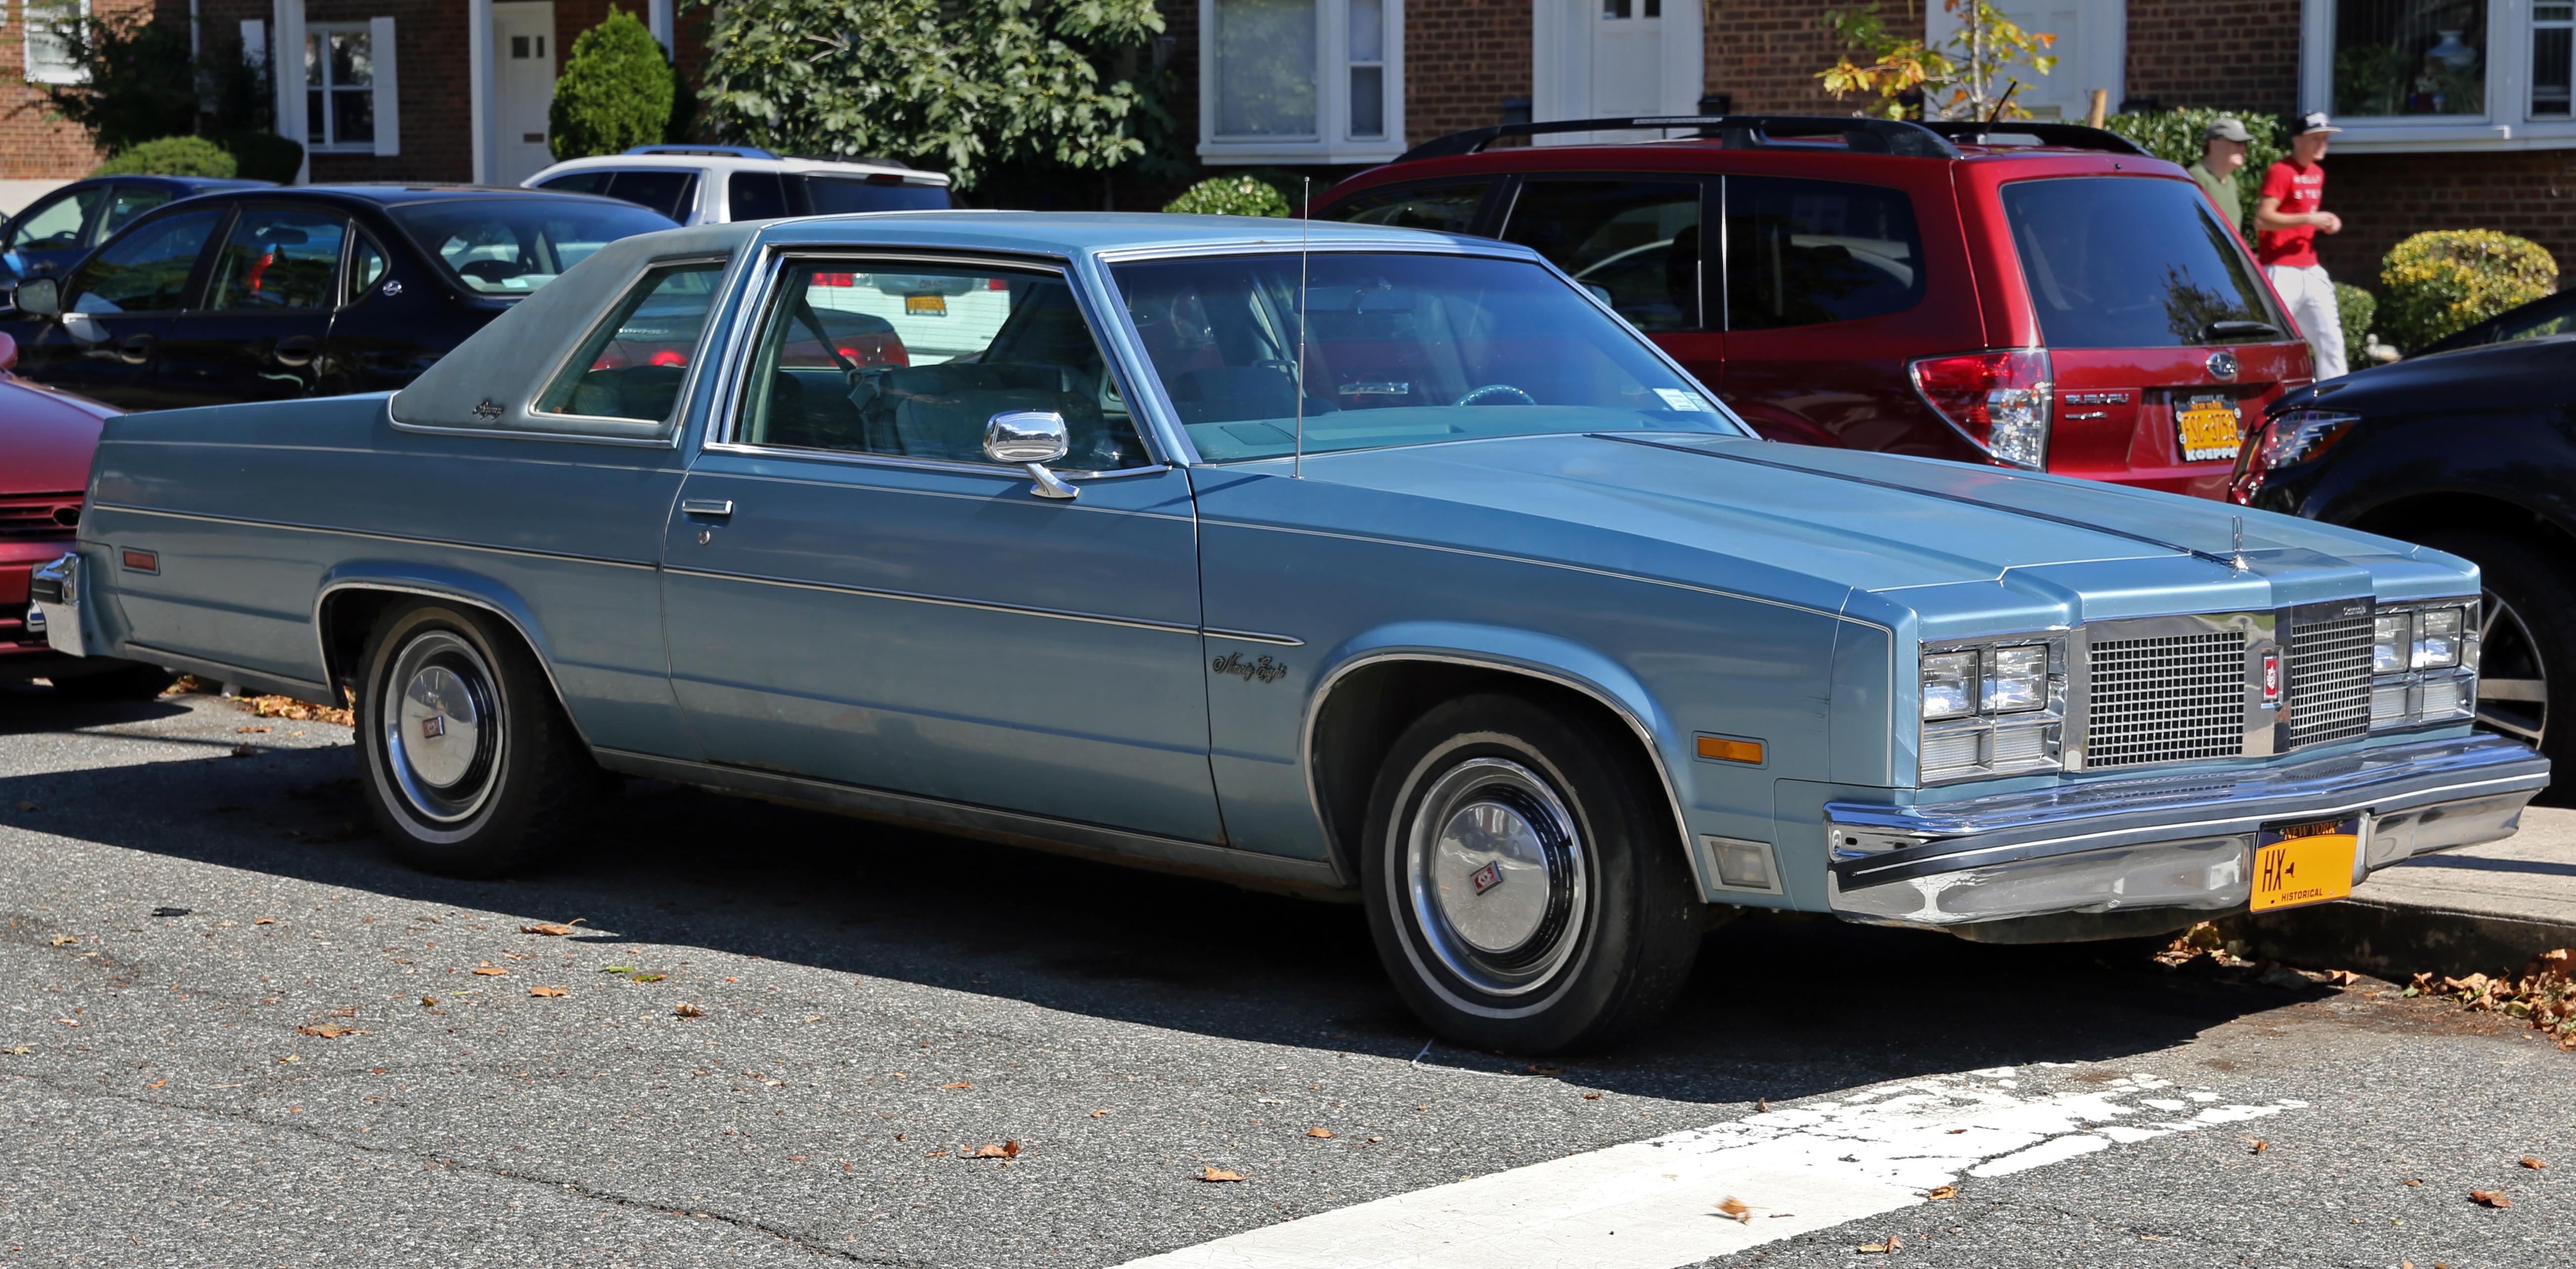 1977_Oldsmobile_98_Regency_hardtop_coupe